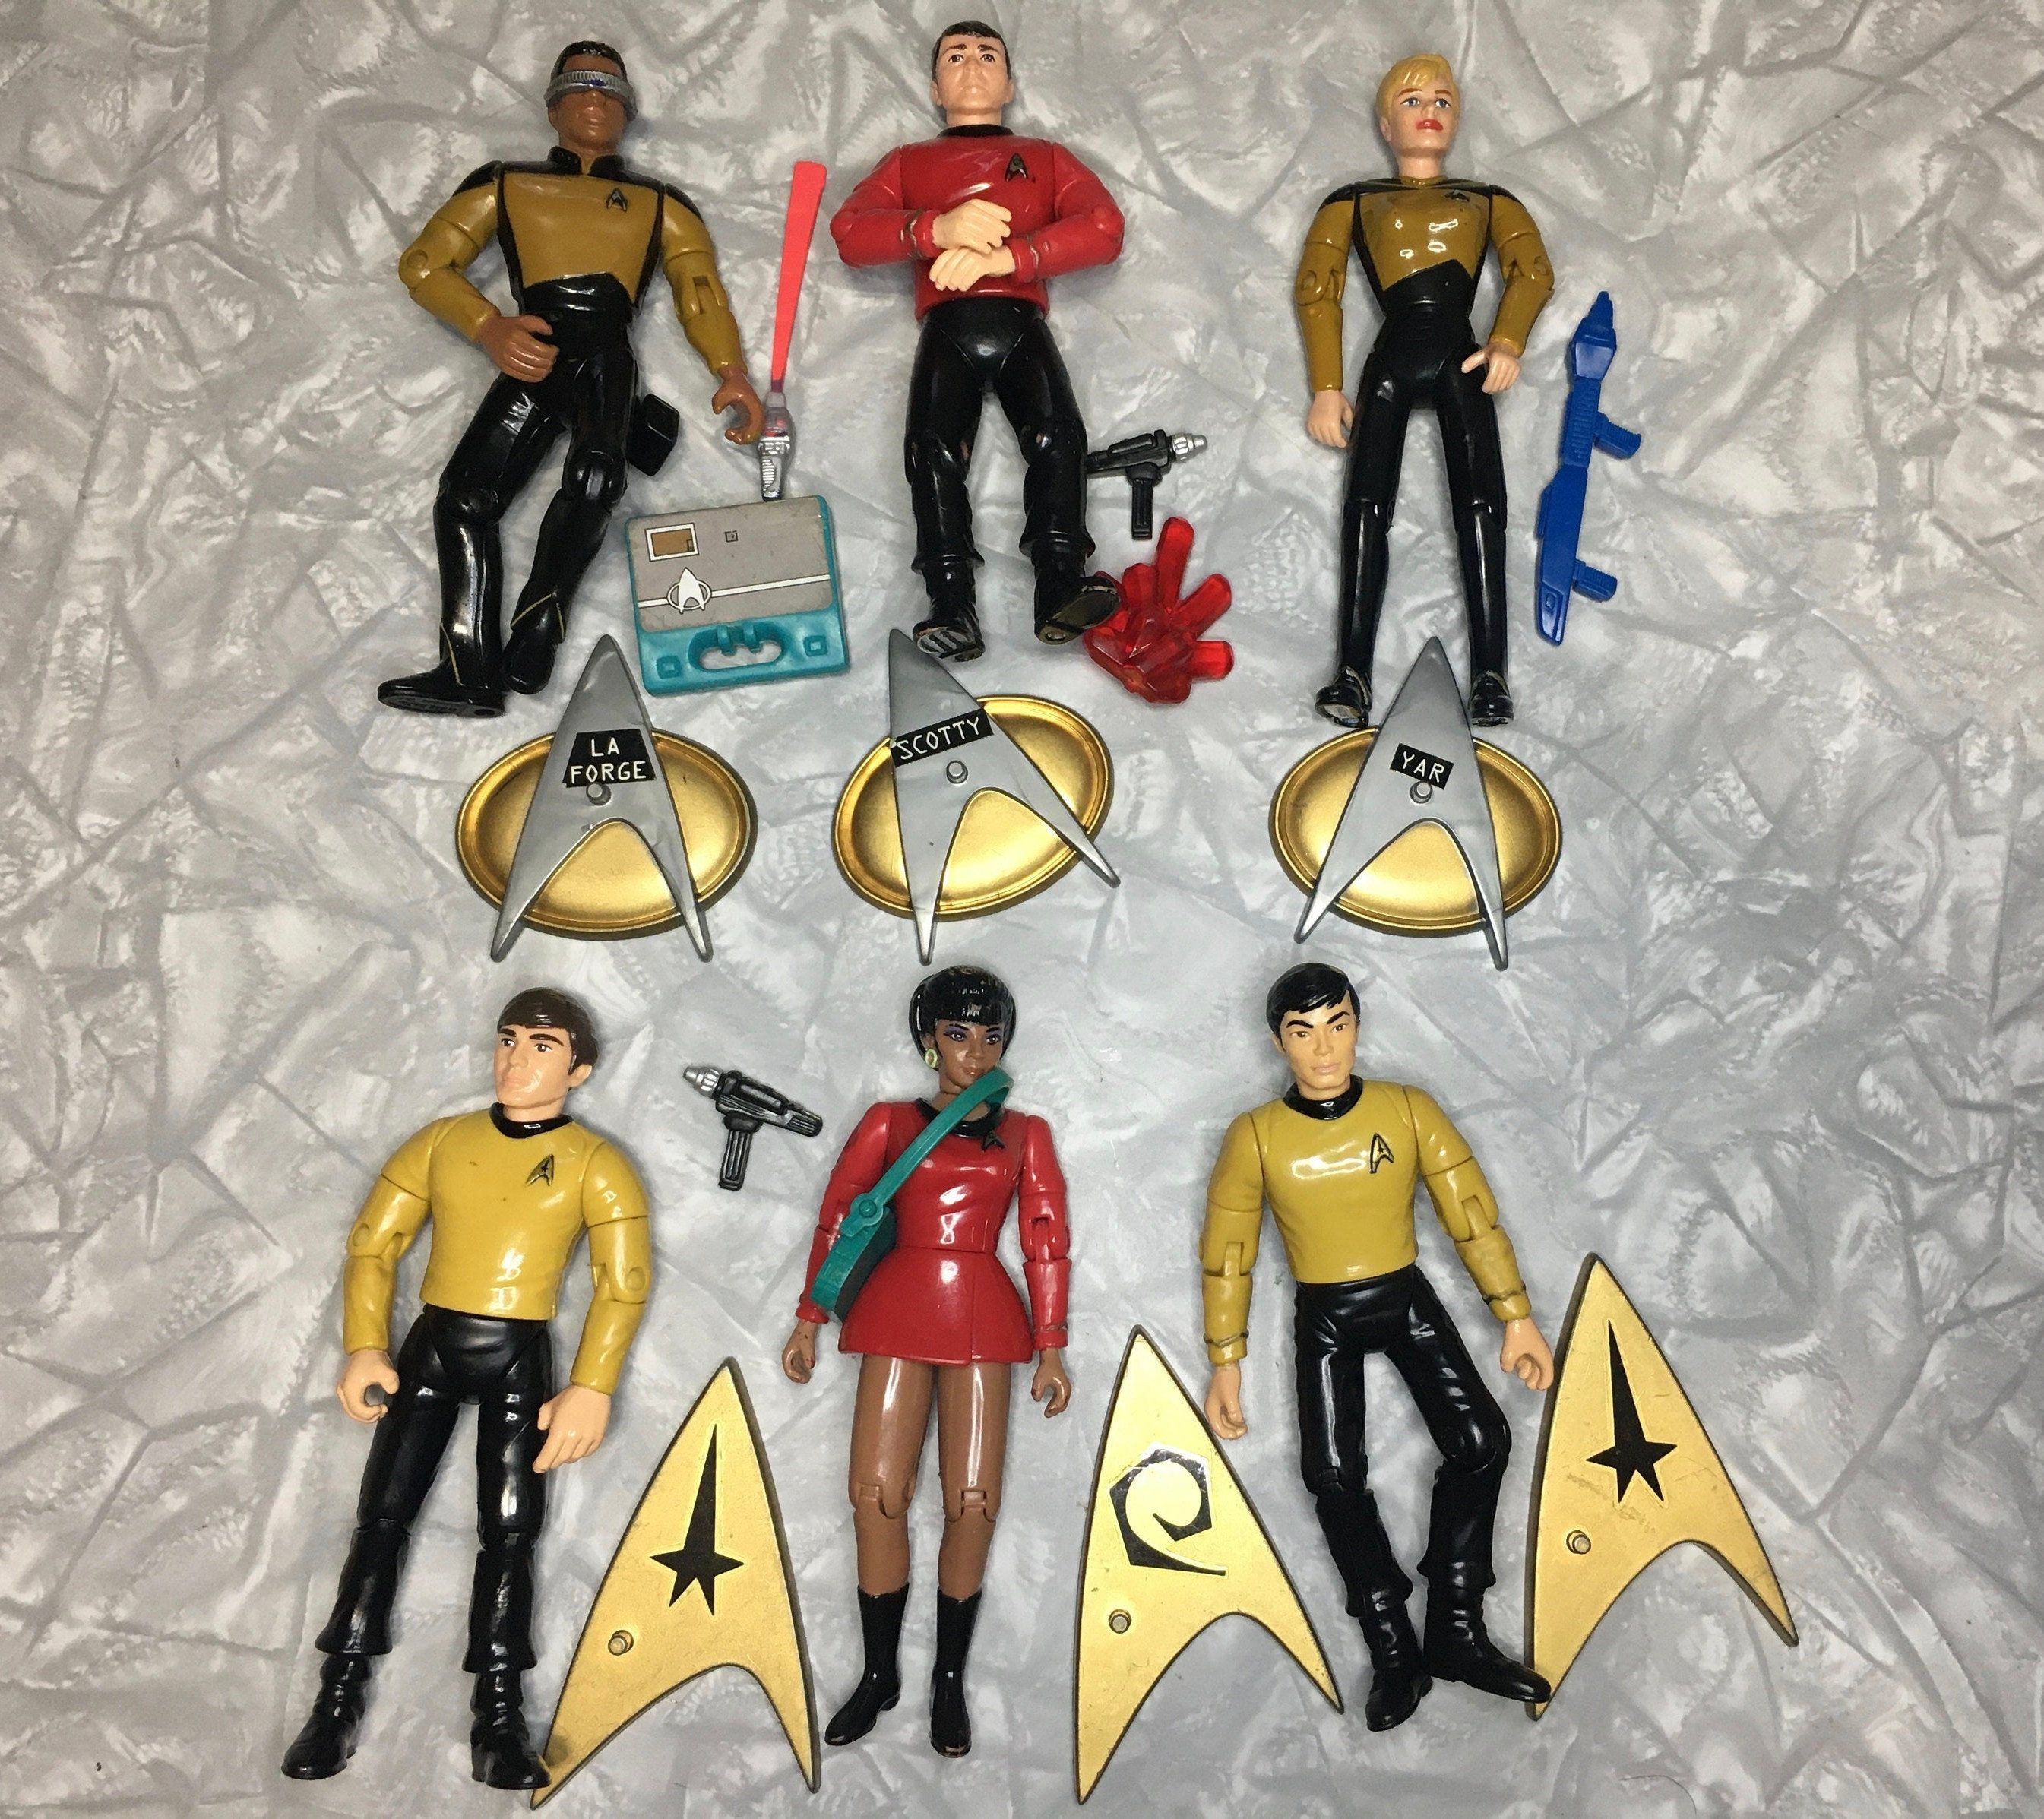 RARE Locutus of Borg Picard Action Figure 1993 Playmates Star Trek TNG MOC